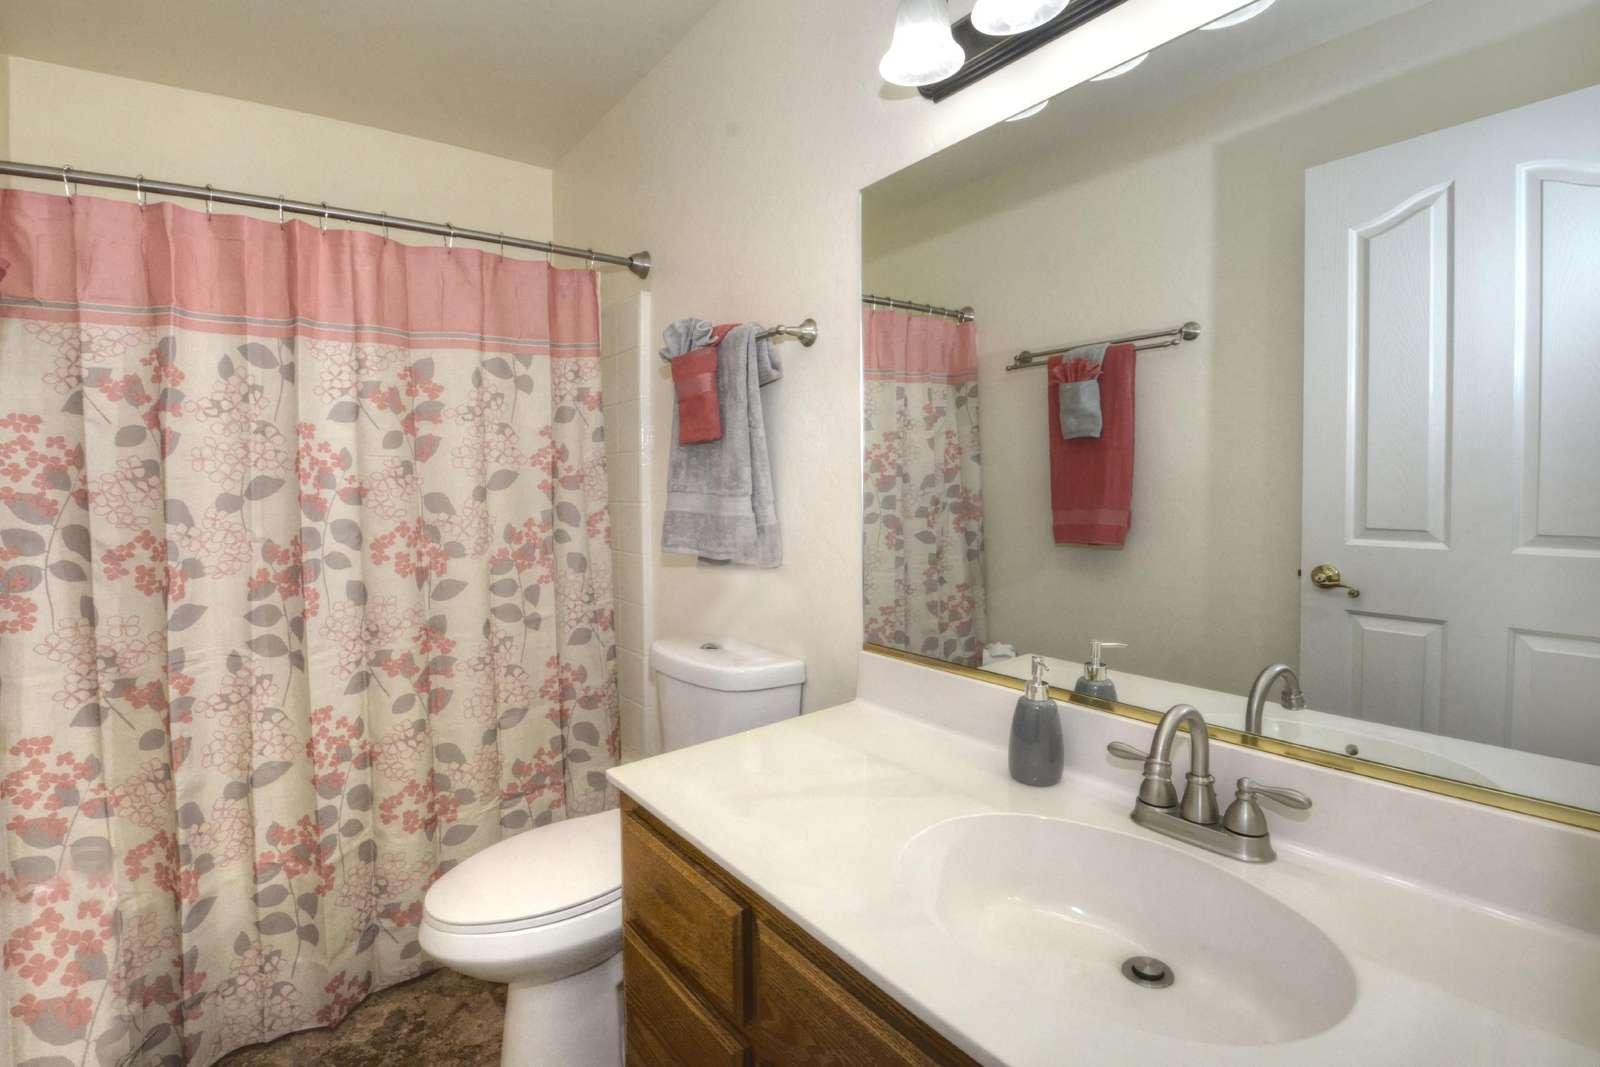 Full bathroom in hallway